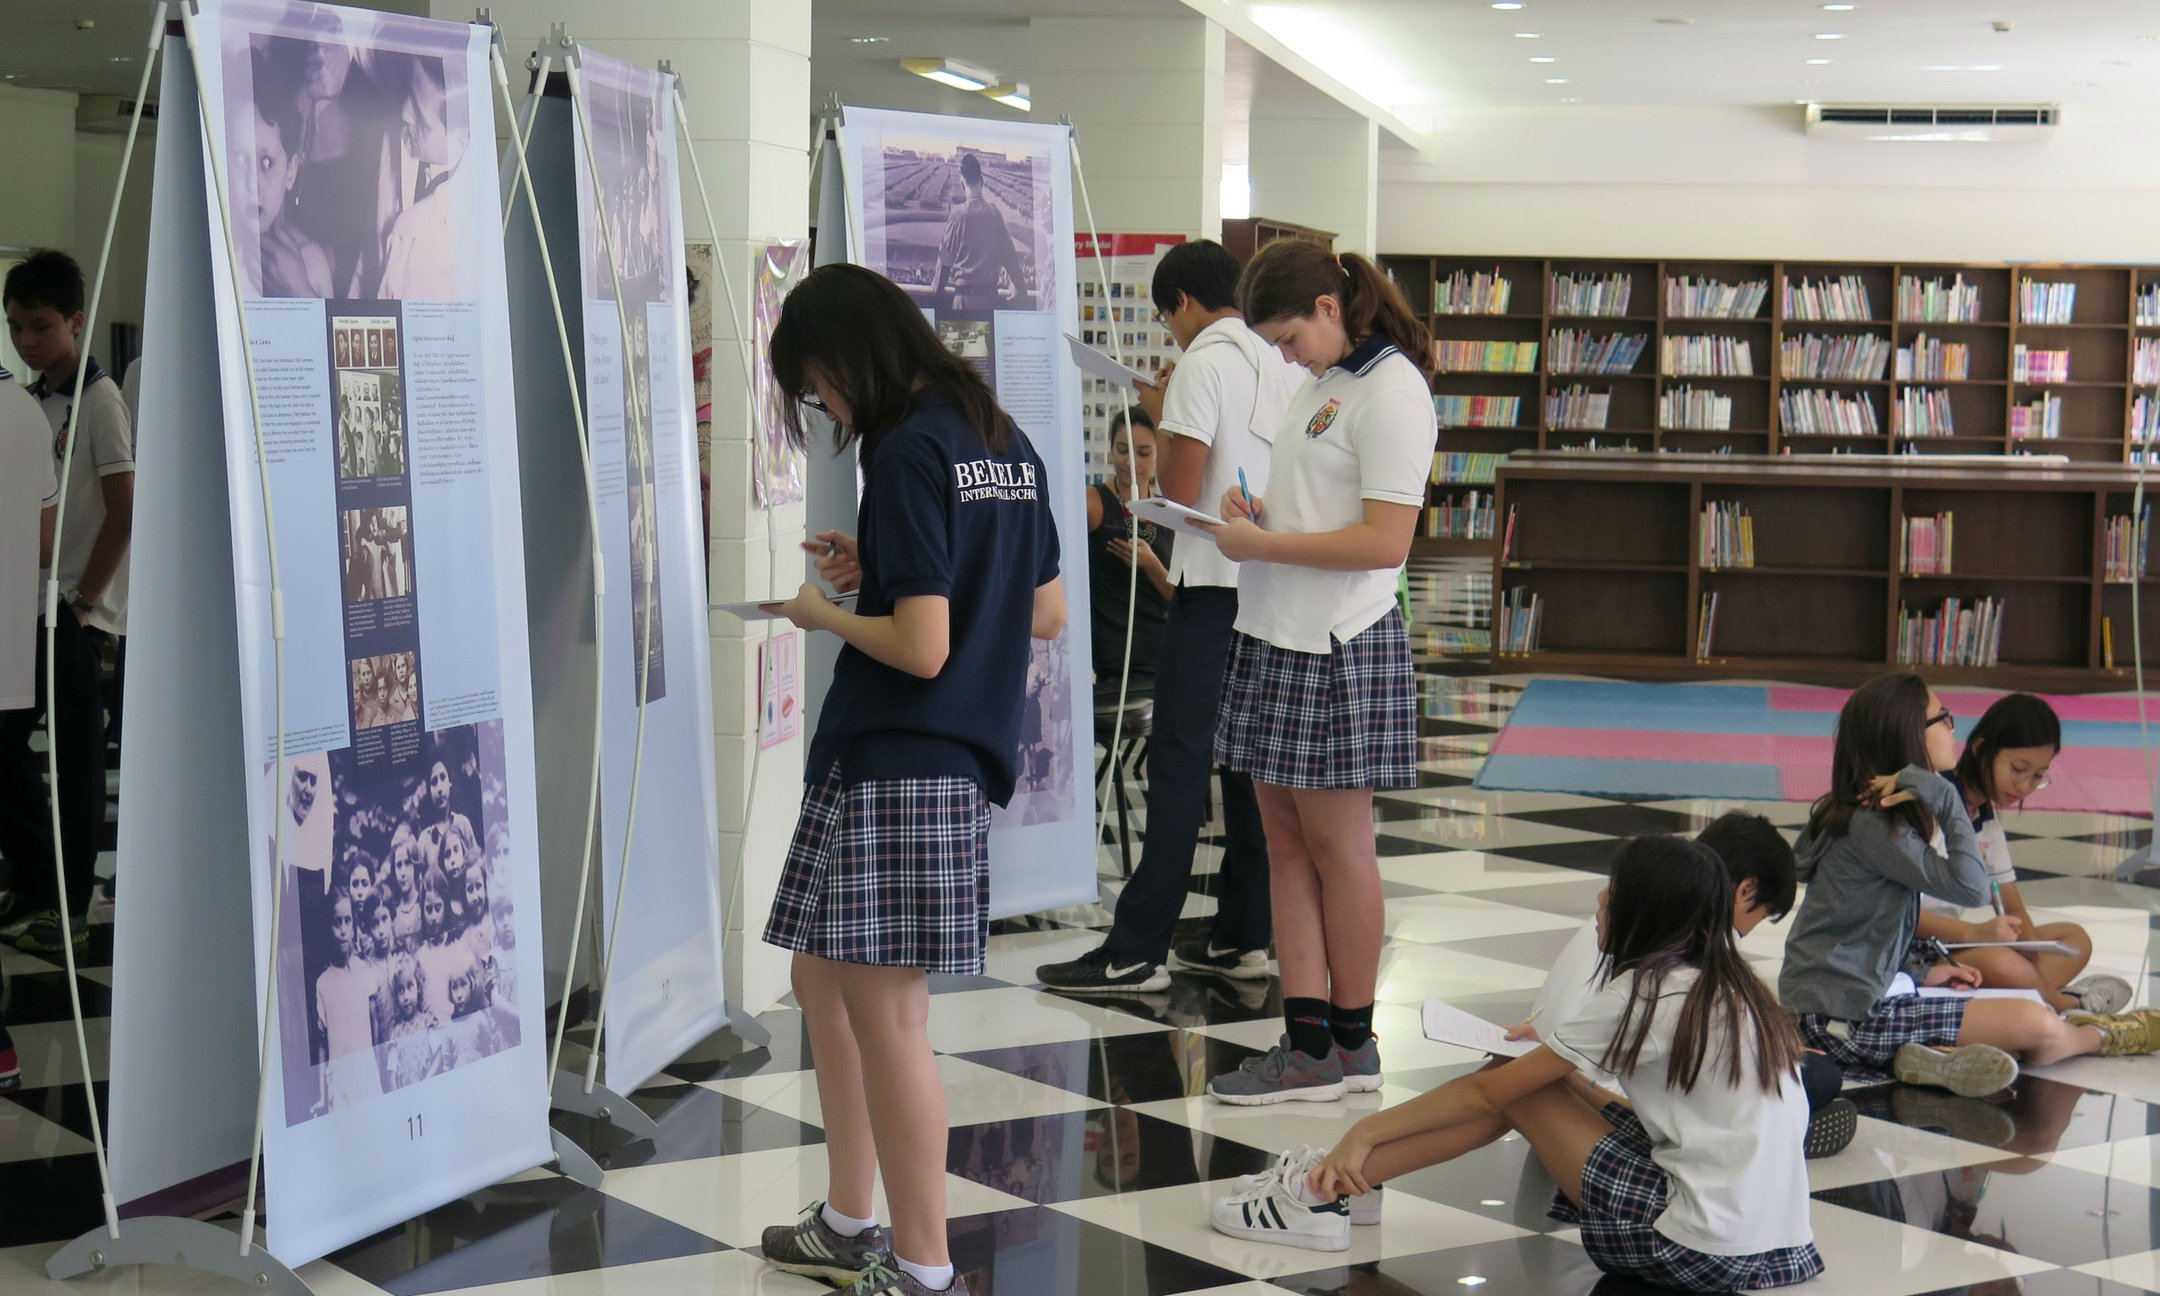 Peer guides preparing for the exhibition in Berkeley International School in Bangkok (November 2016)